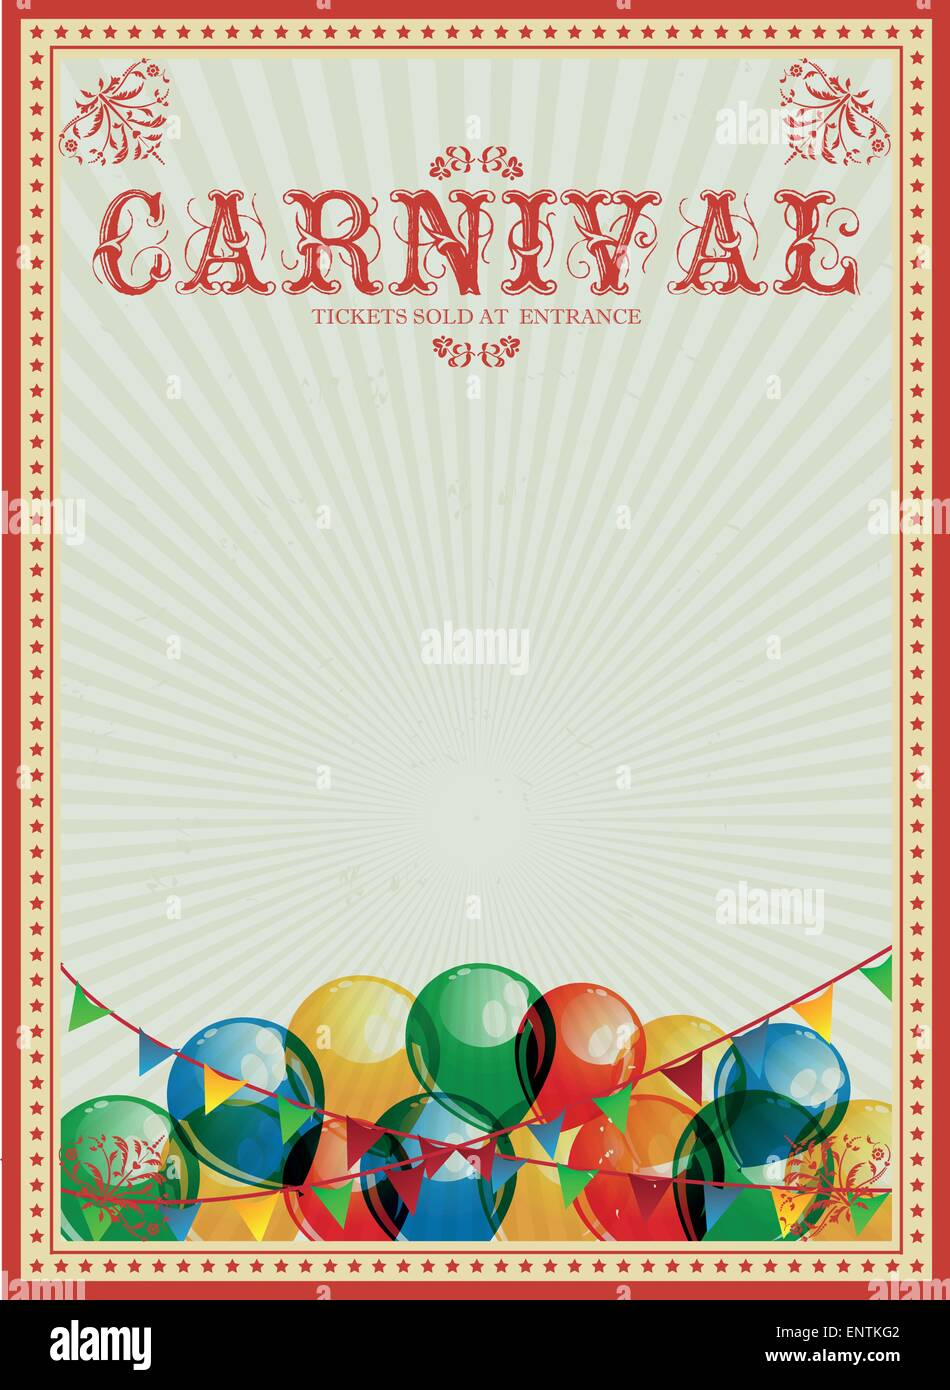 carnival poster mardi gras venice carnival banner holiday stock